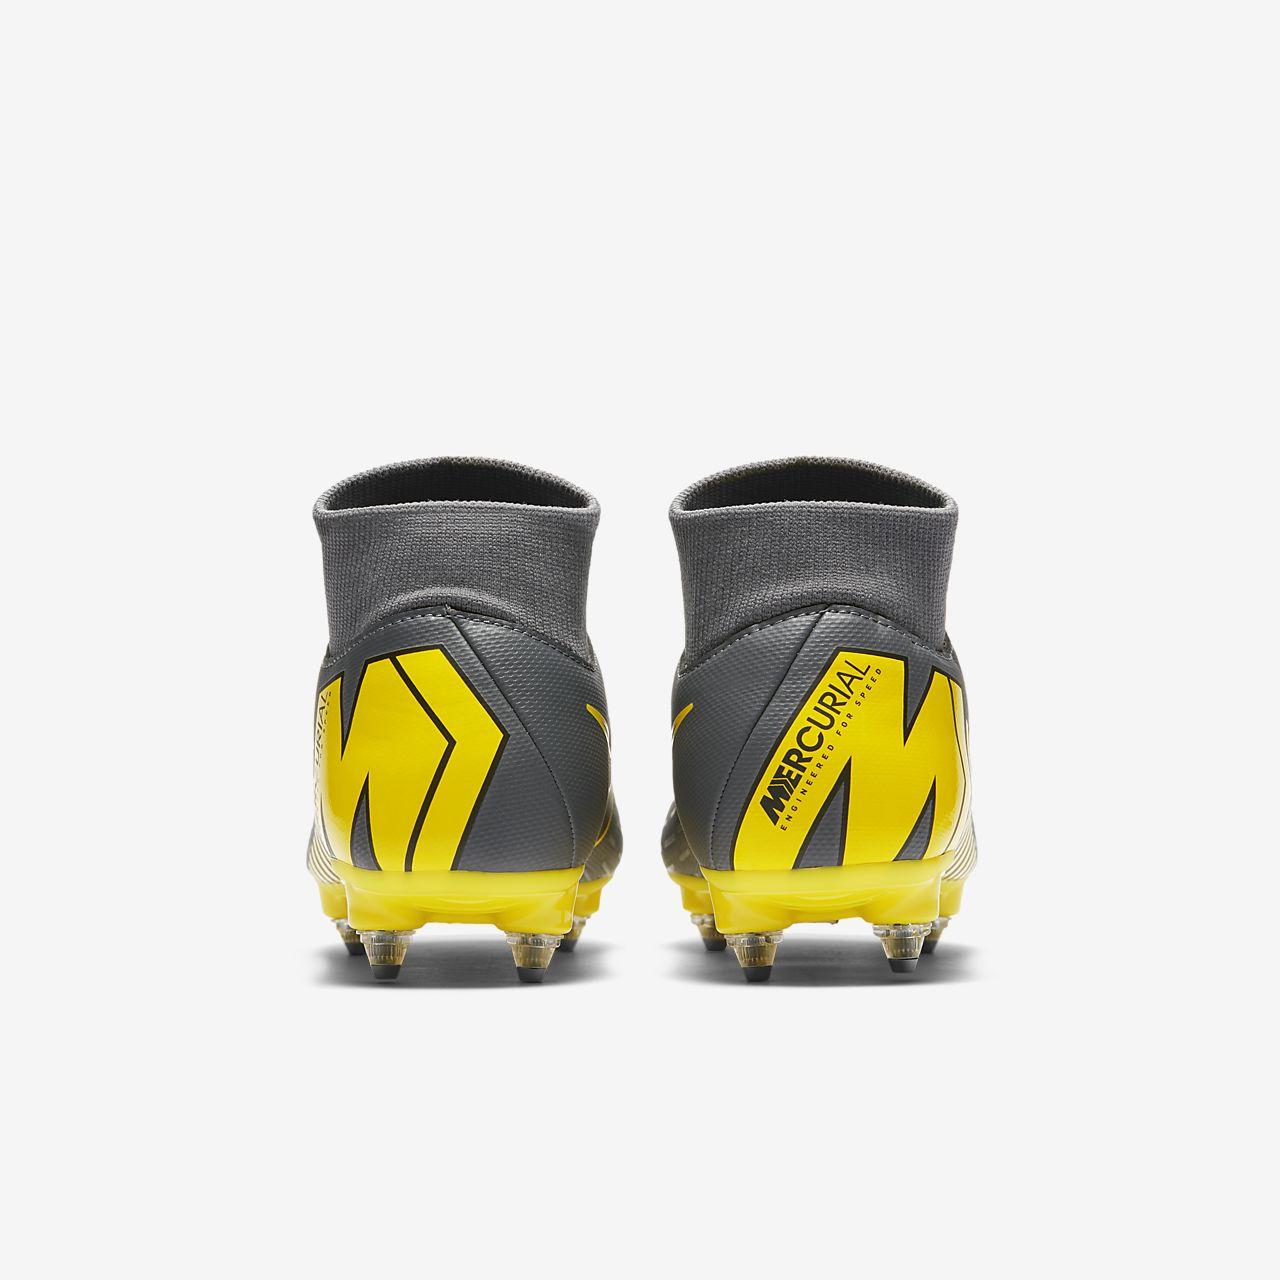 d09380aa ... Футбольные бутсы для игры на мягком грунте Nike Mercurial Superfly VI  Academy SG-PRO